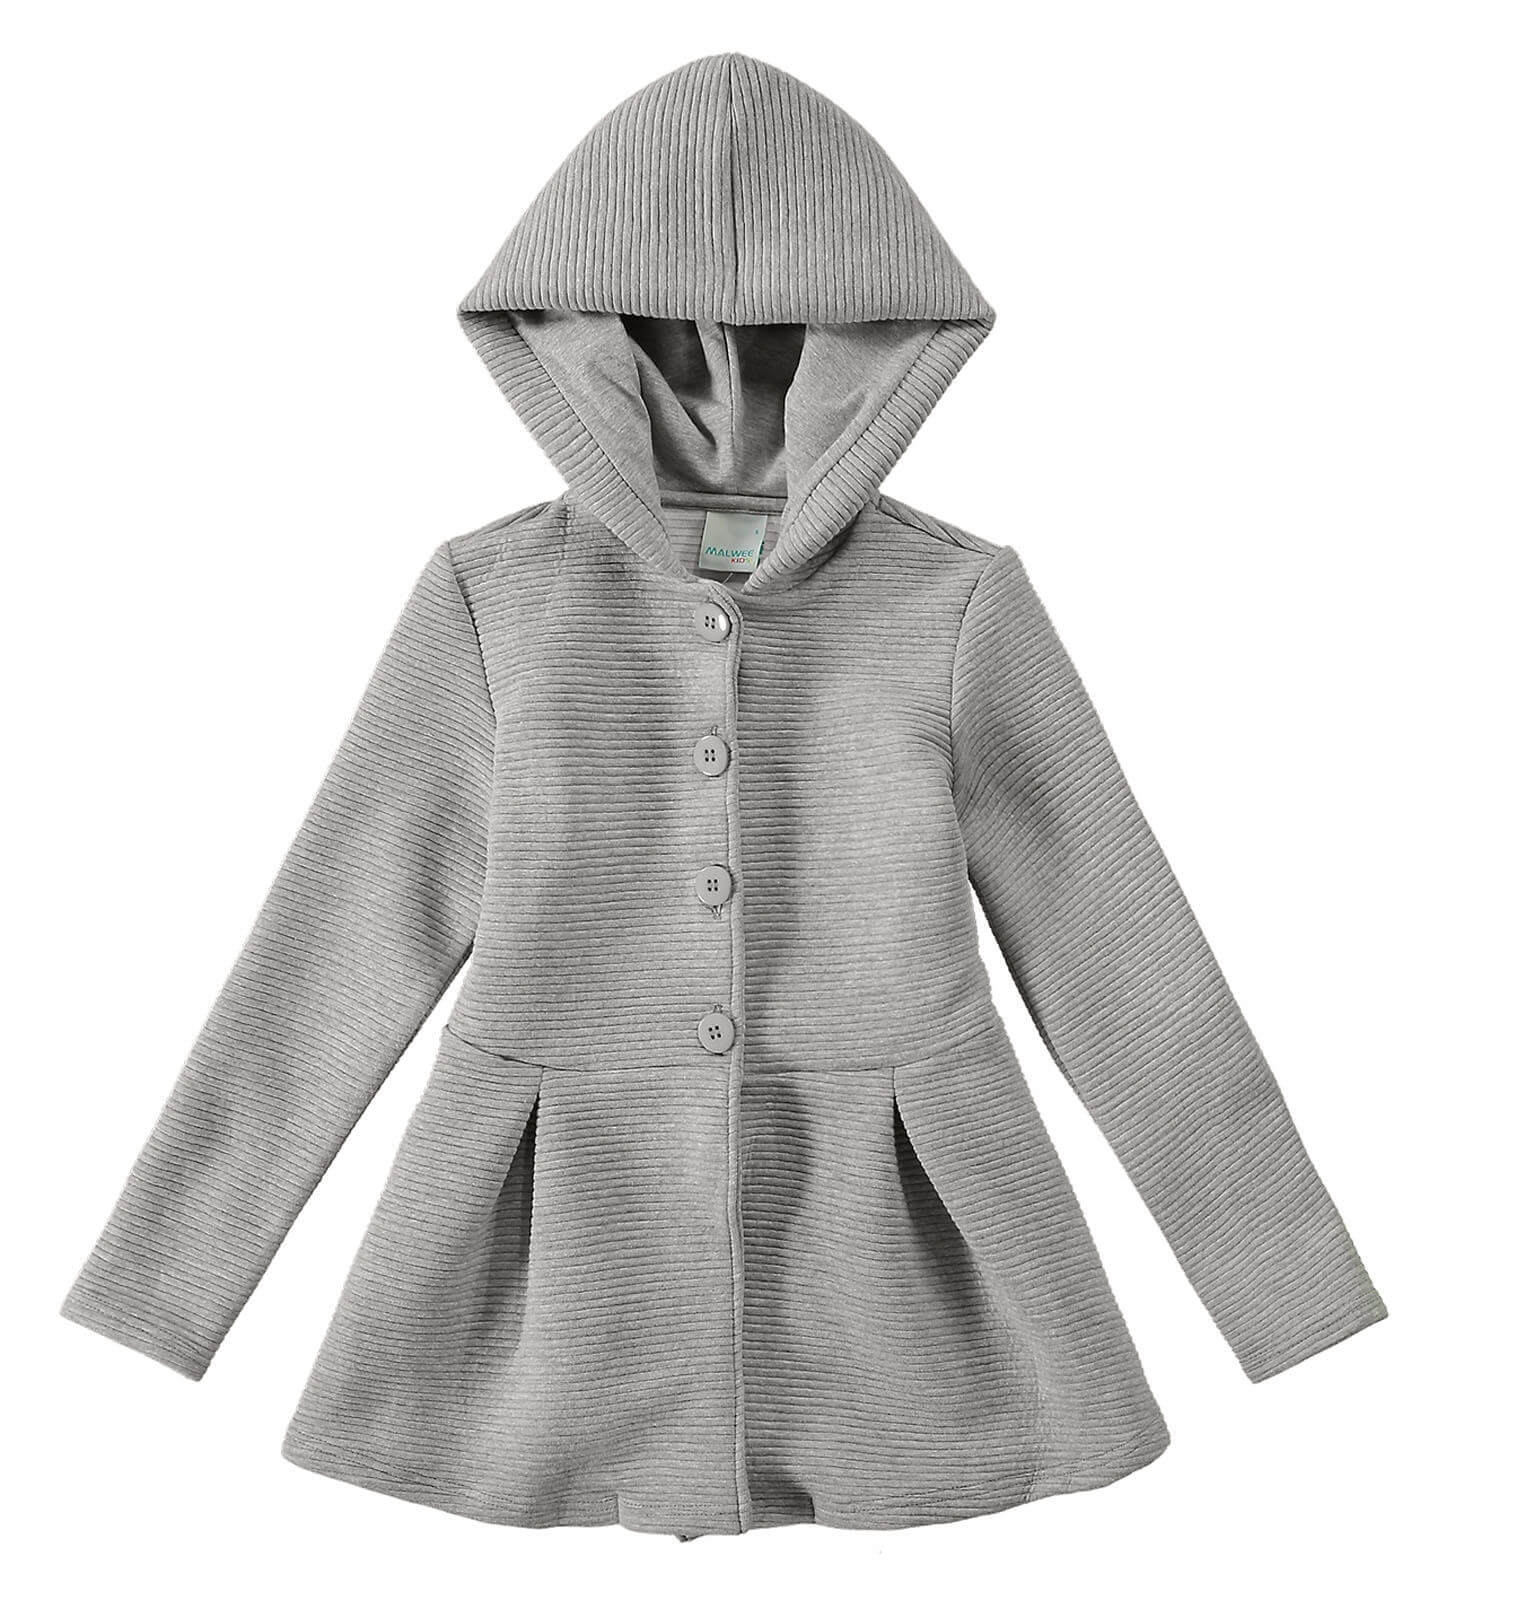 Sobretudo Infantil Feminino Inverno Cinza Mescla Malwee